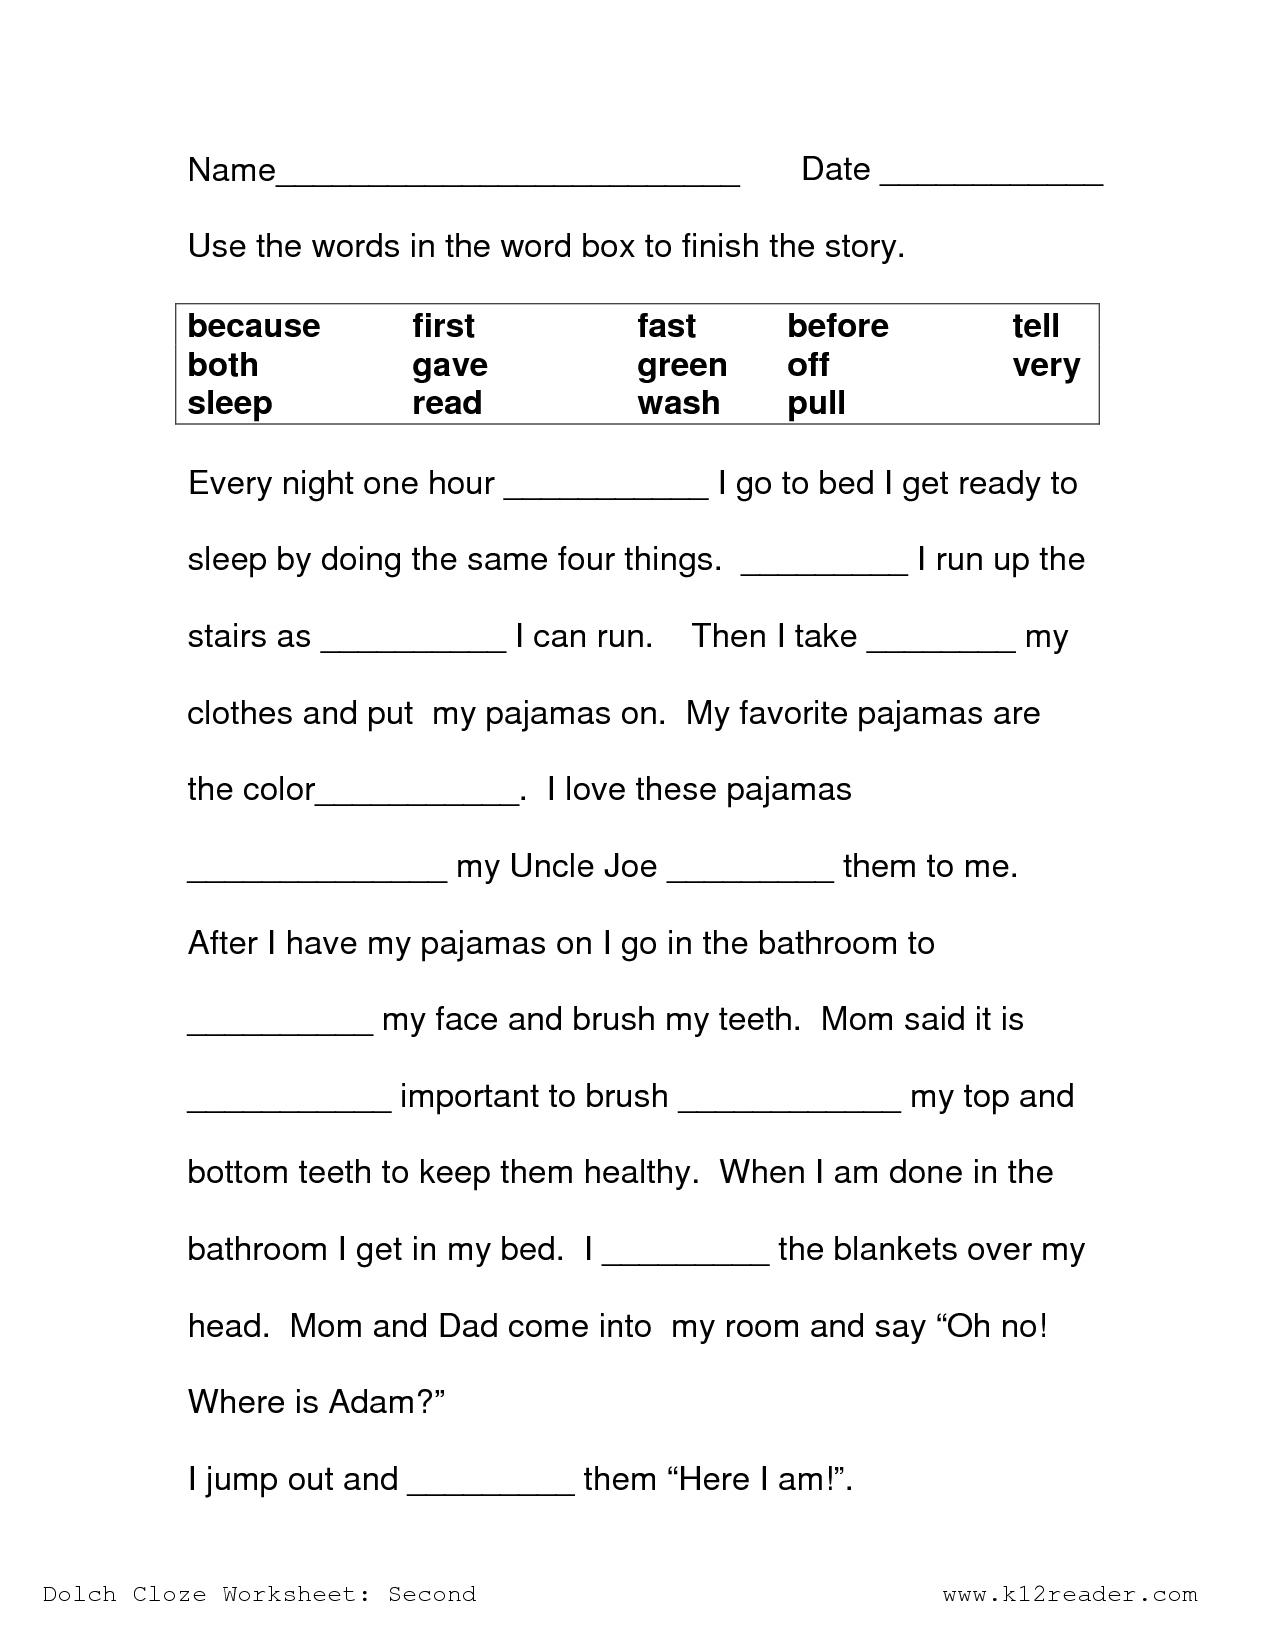 Math Worksheet: 2Nd Grade Science Worksheets Free Printable Easy - 4Th Grade Crossword Puzzles Printable